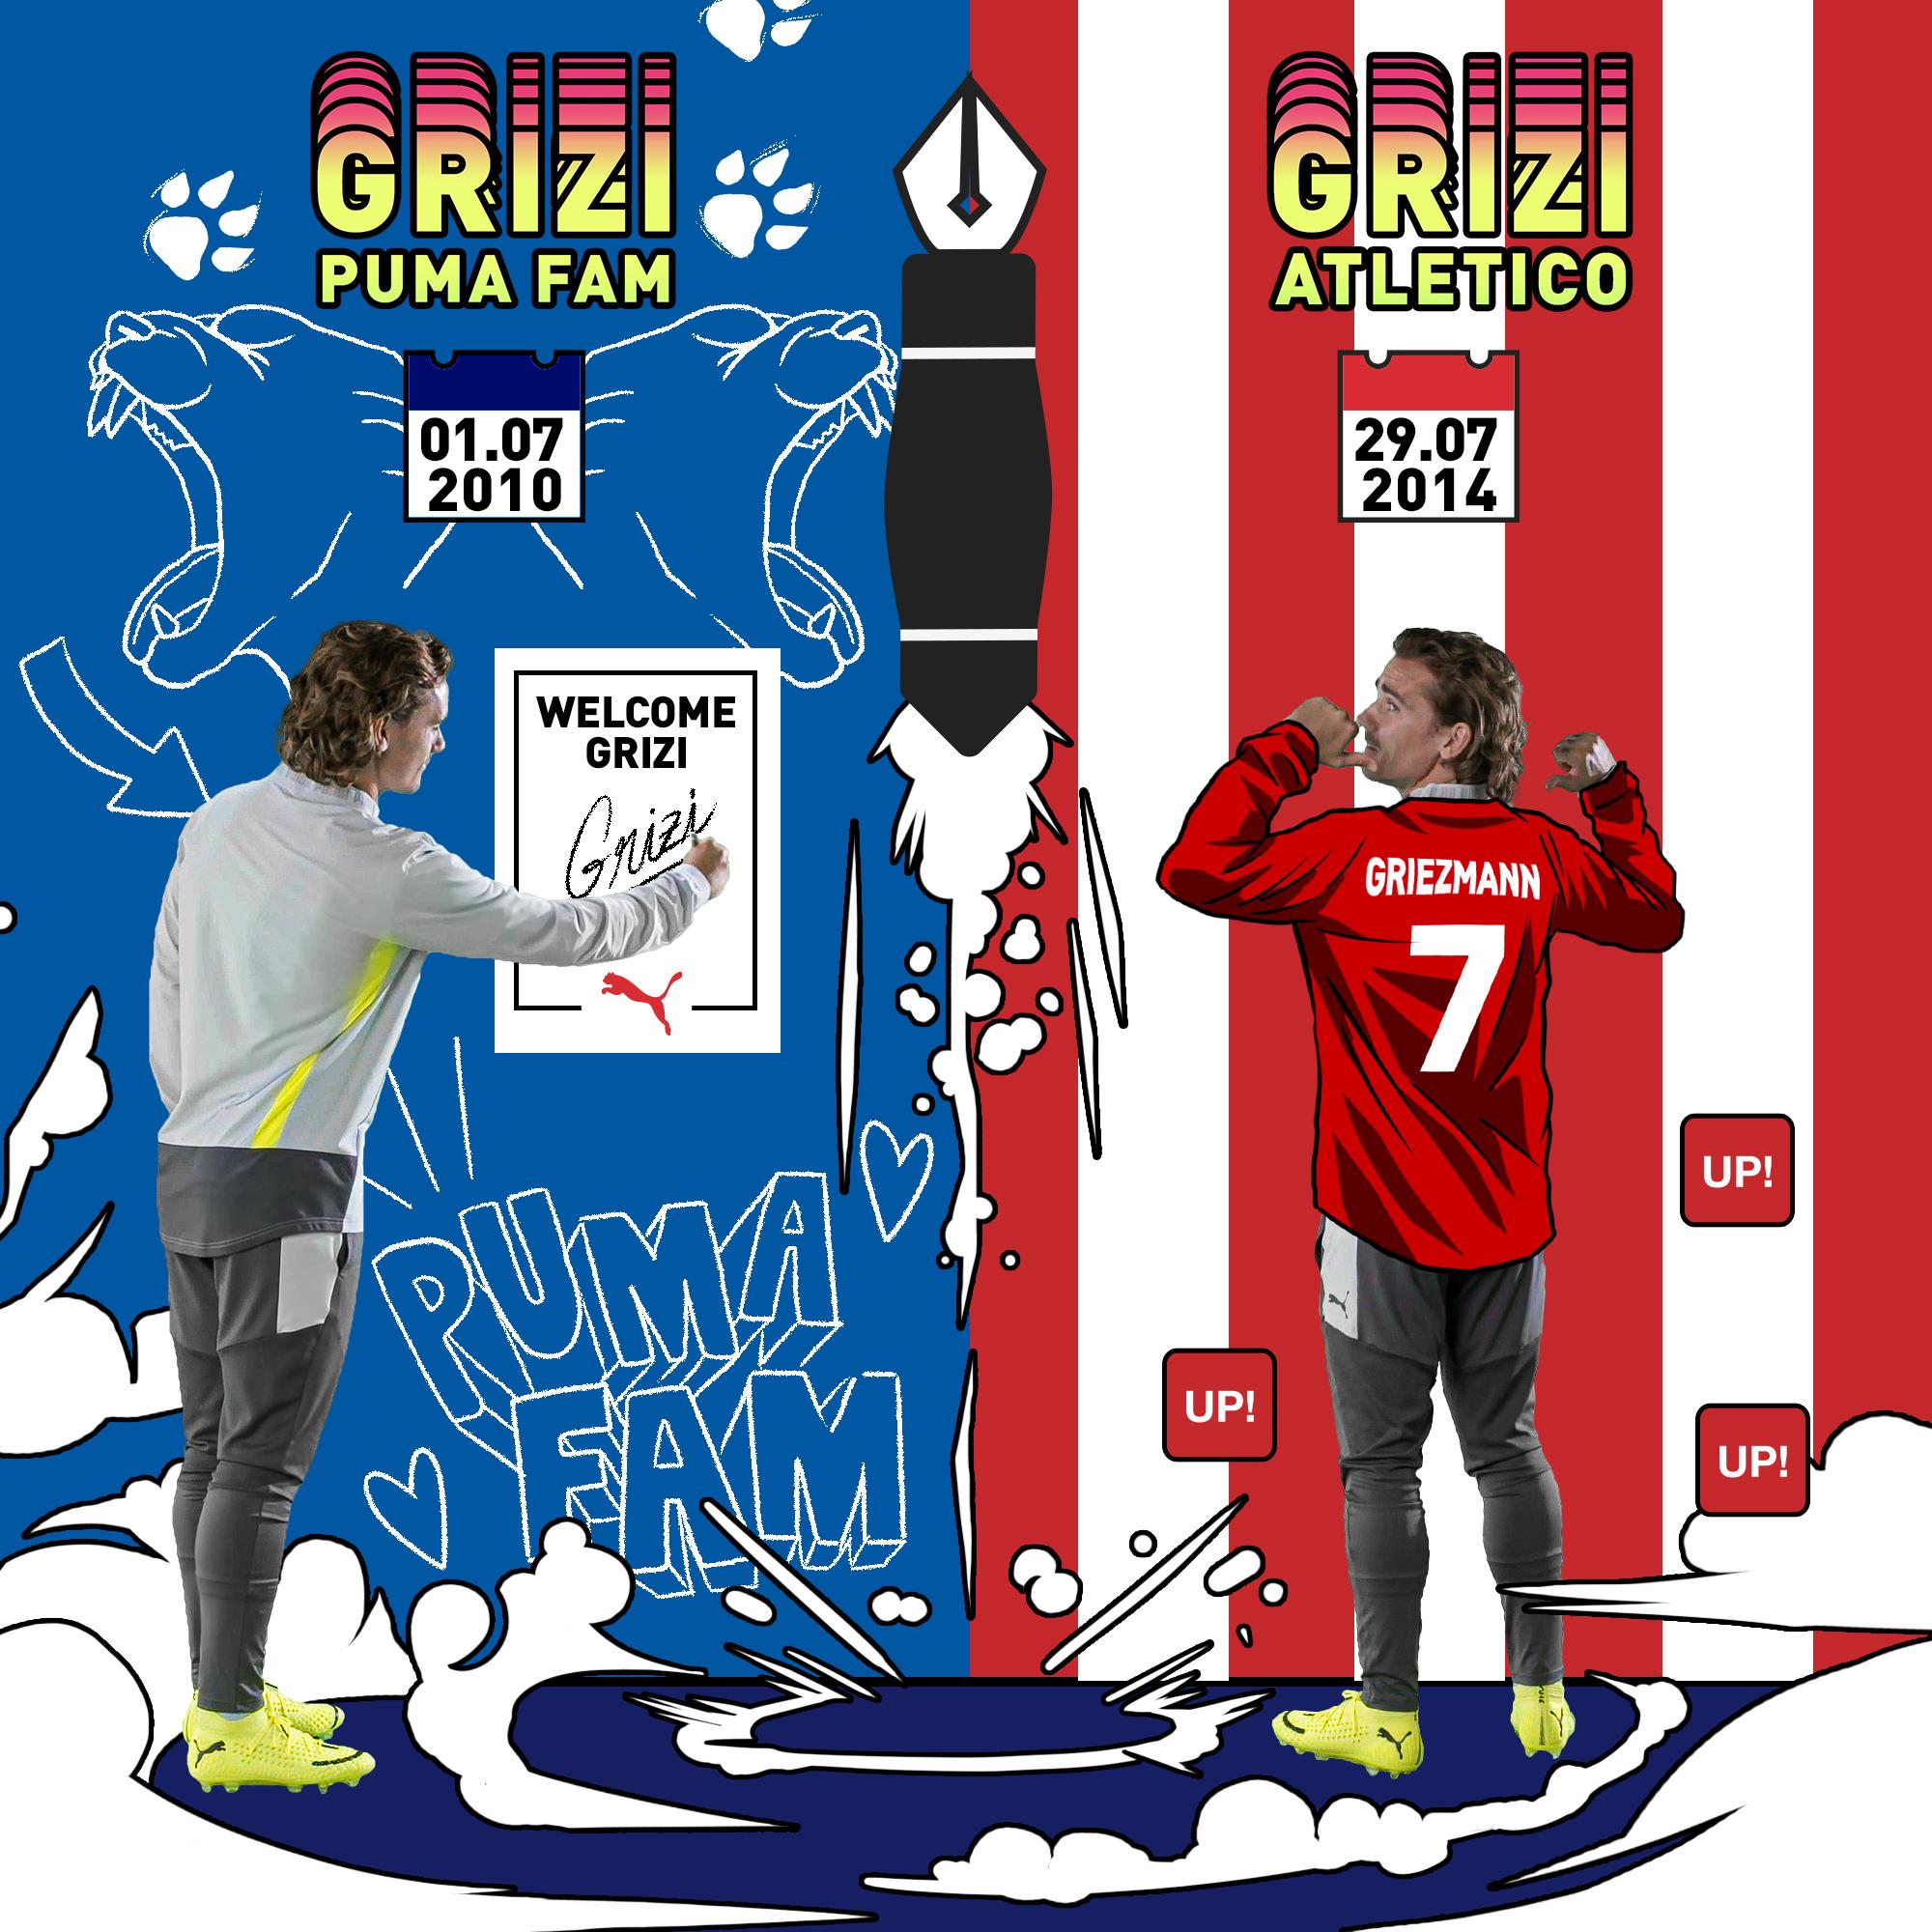 19AW_Social_IG_TS_Football_Griezmann-Special-Edition_FUTURE_Q4_2000x2000_004.jpg